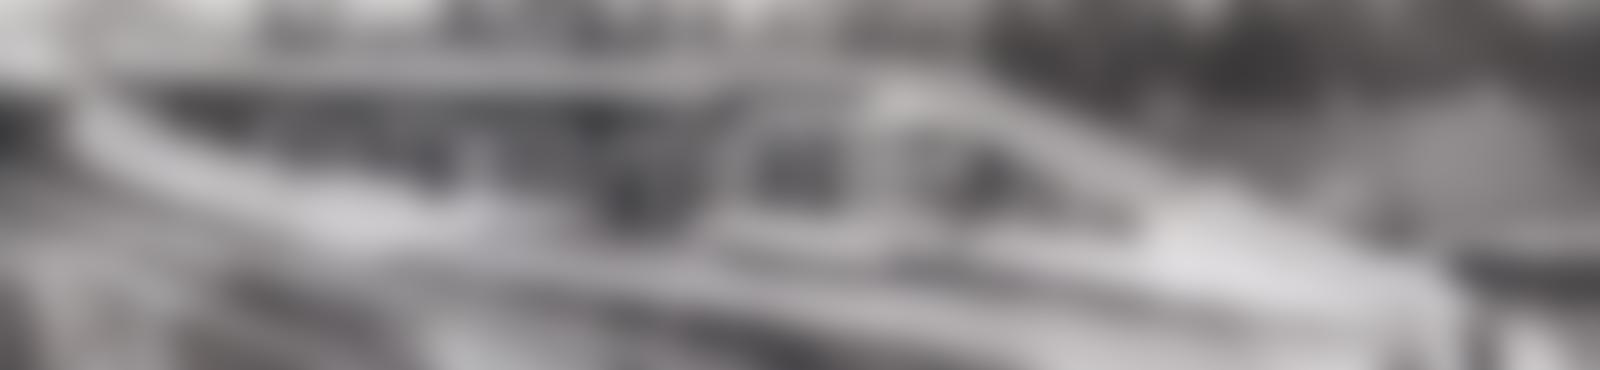 Blurred 3ab80973 83f1 4484 9f28 85afdb11aff4